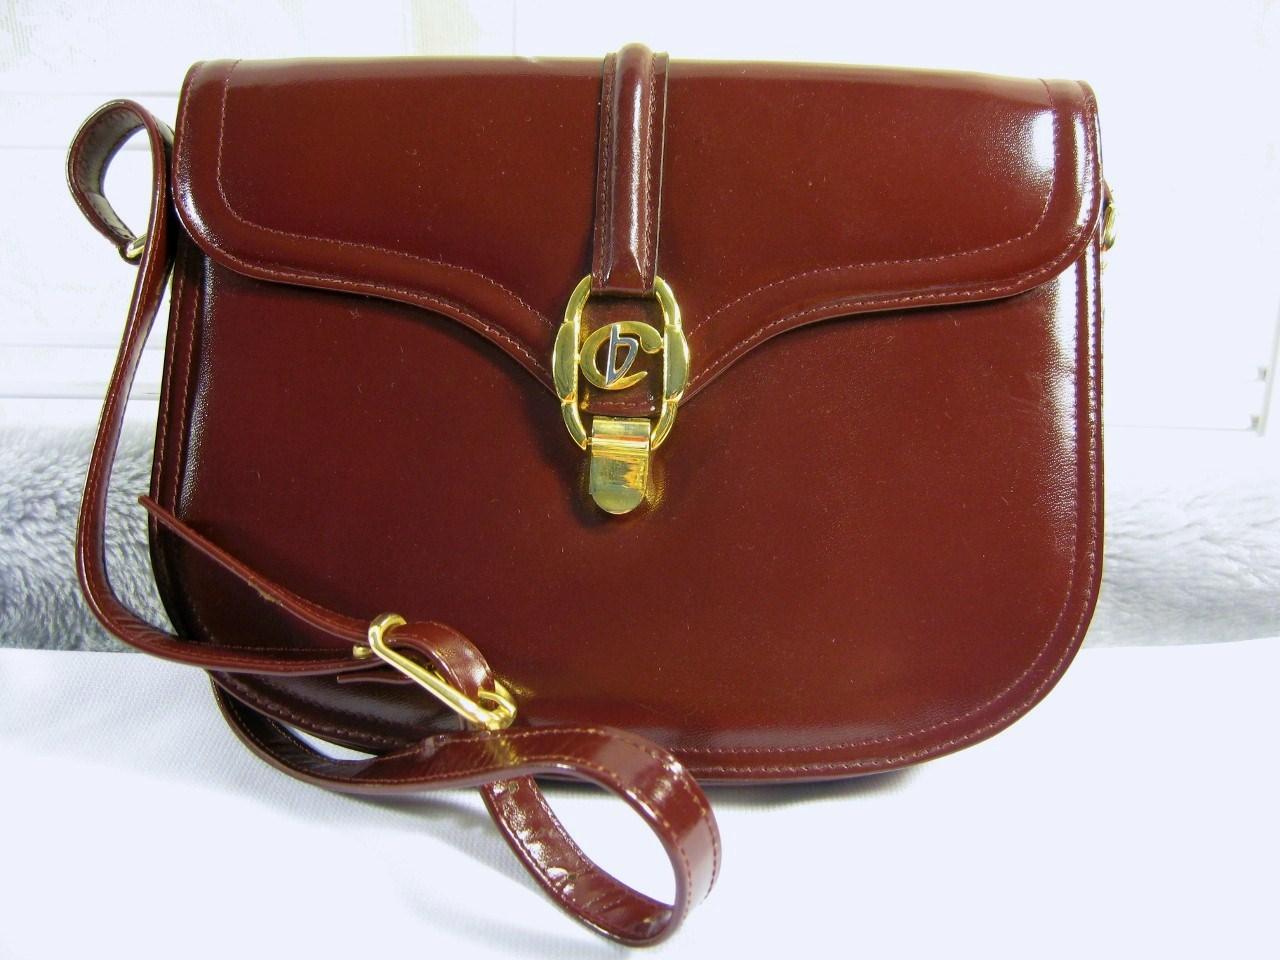 VINTAGE STYLE Chris baleen Italiana burgundy LEATHER GOLD BUCKLE STRIP HAND BAG